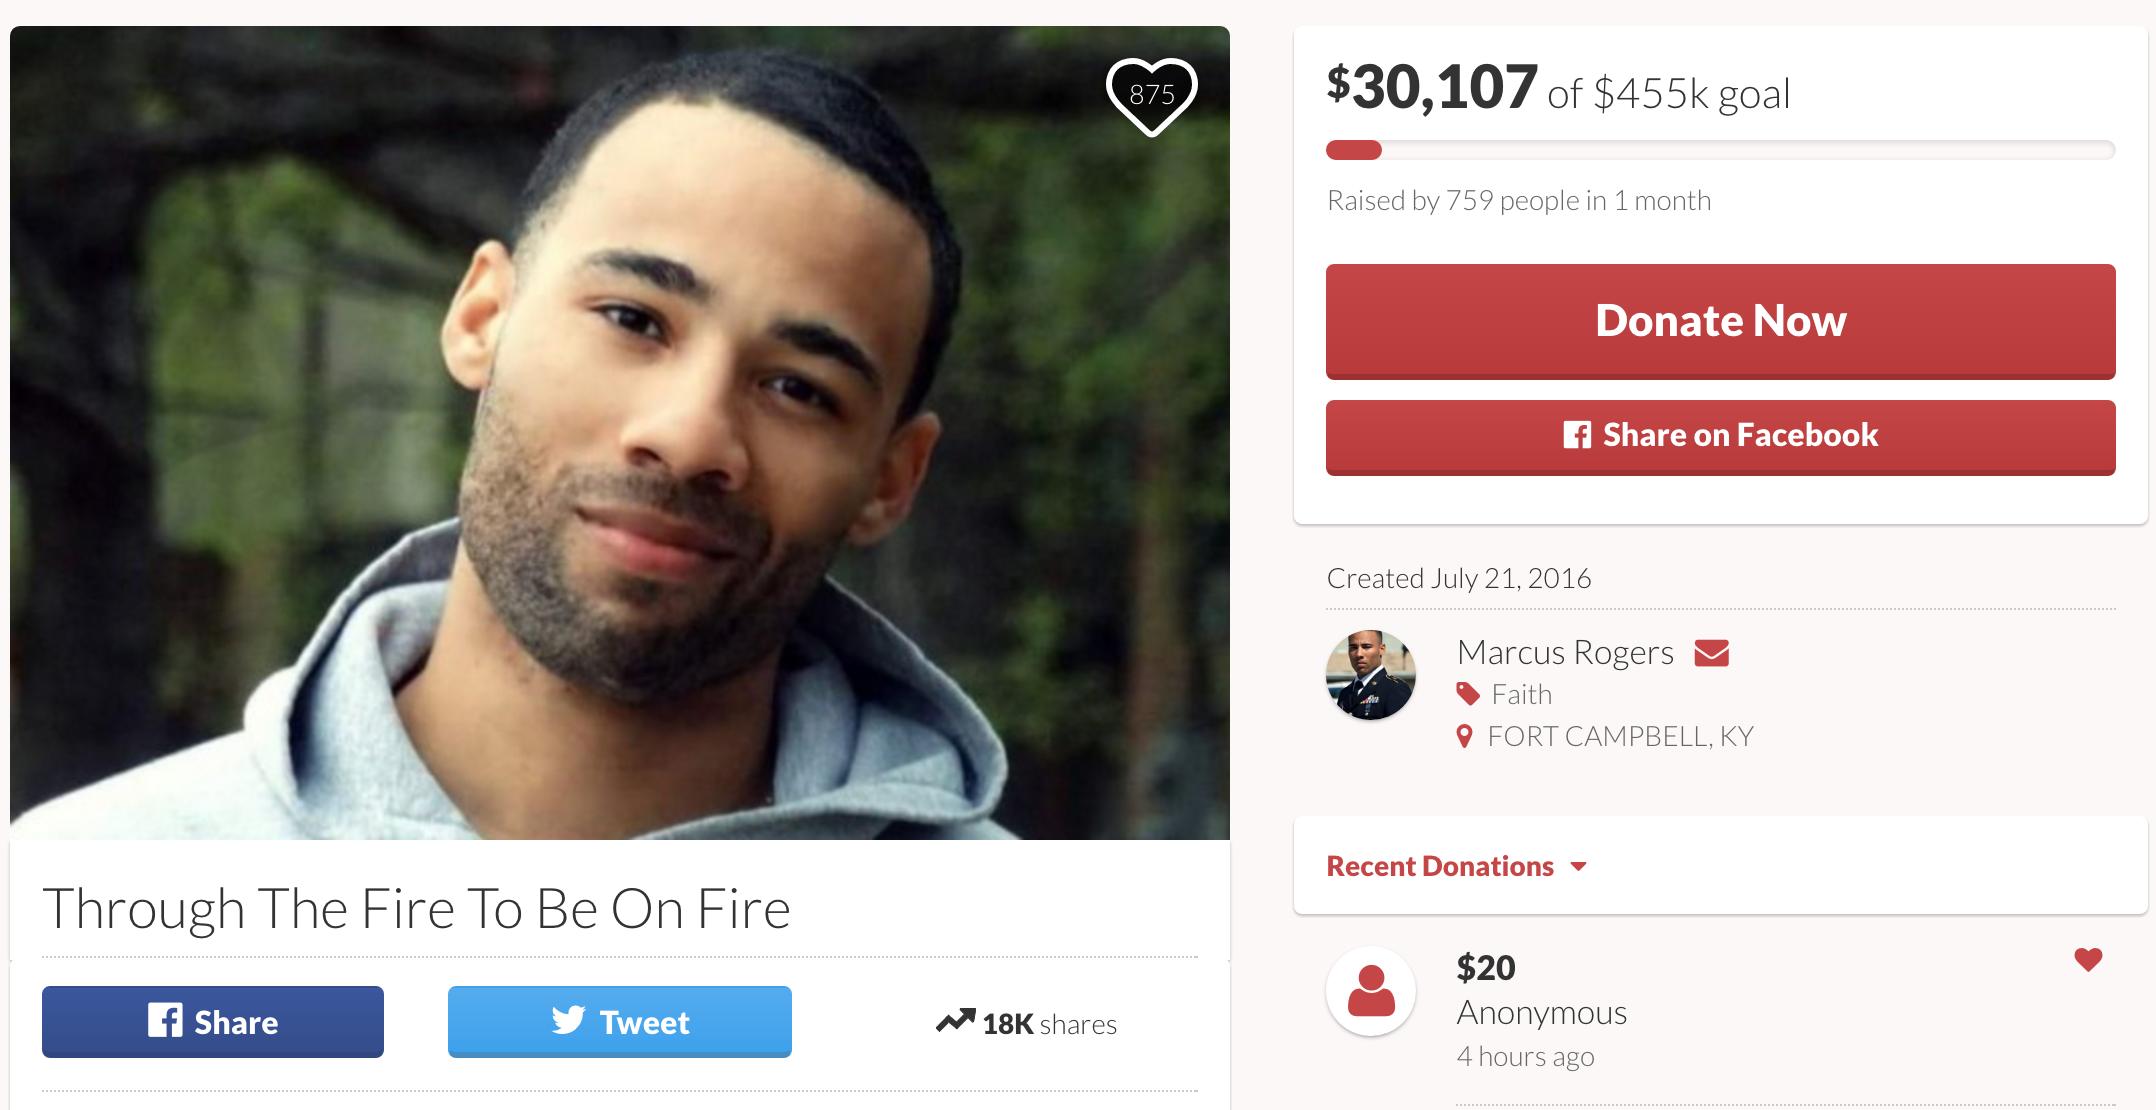 christian preacher who tried raising  455 000  for no reason  will end fundraiser  30 000 richer